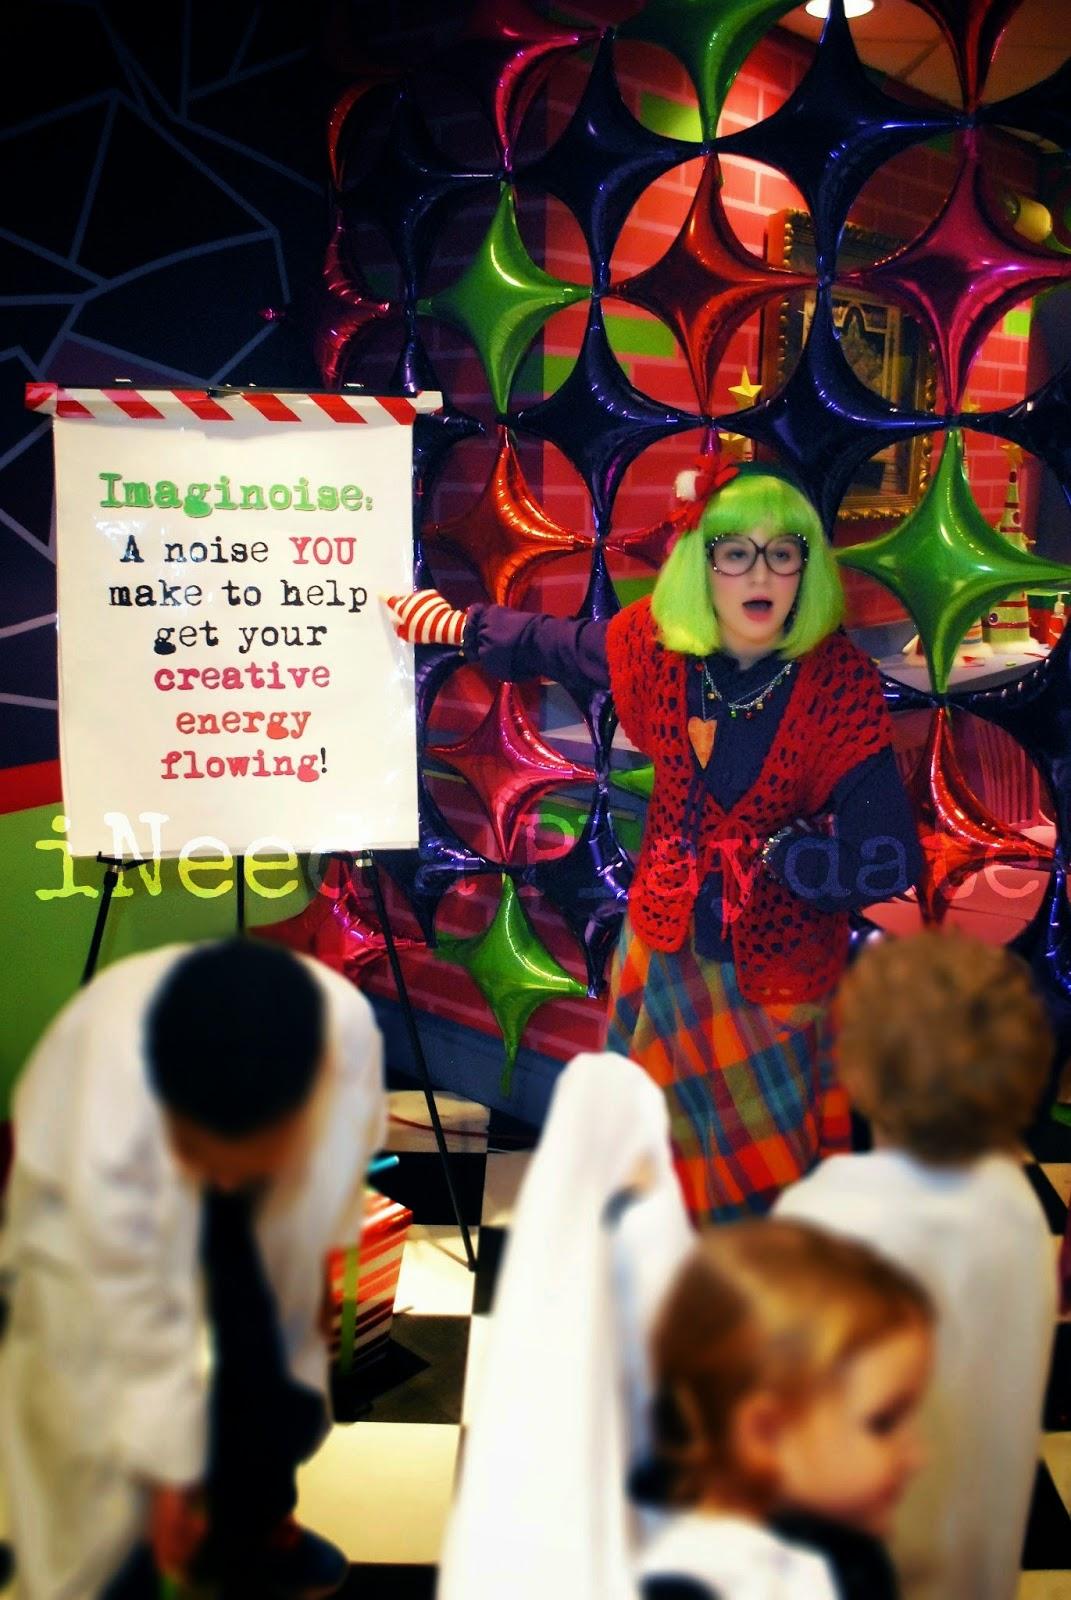 Imaginoise